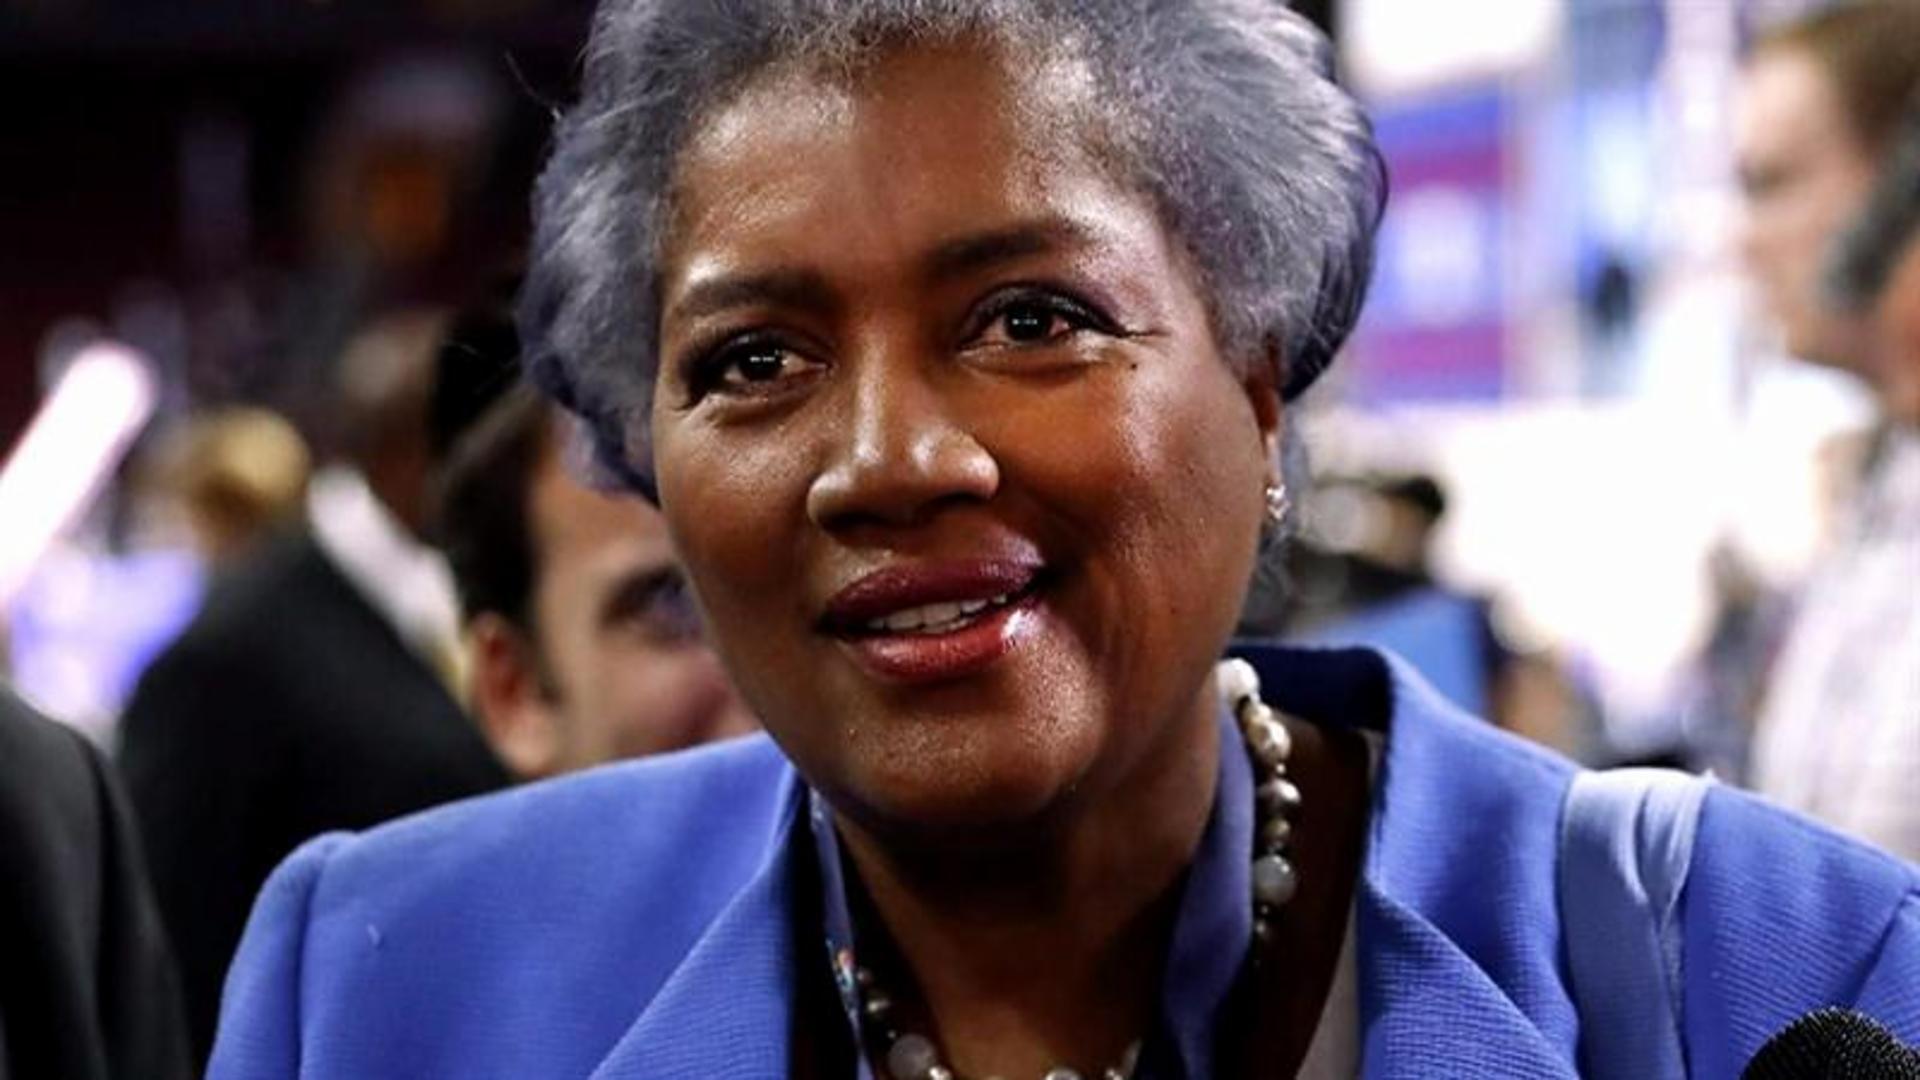 Clinton Campaign Staffers Accuse Brazile Of Buying Into 'Russian Propaganda'